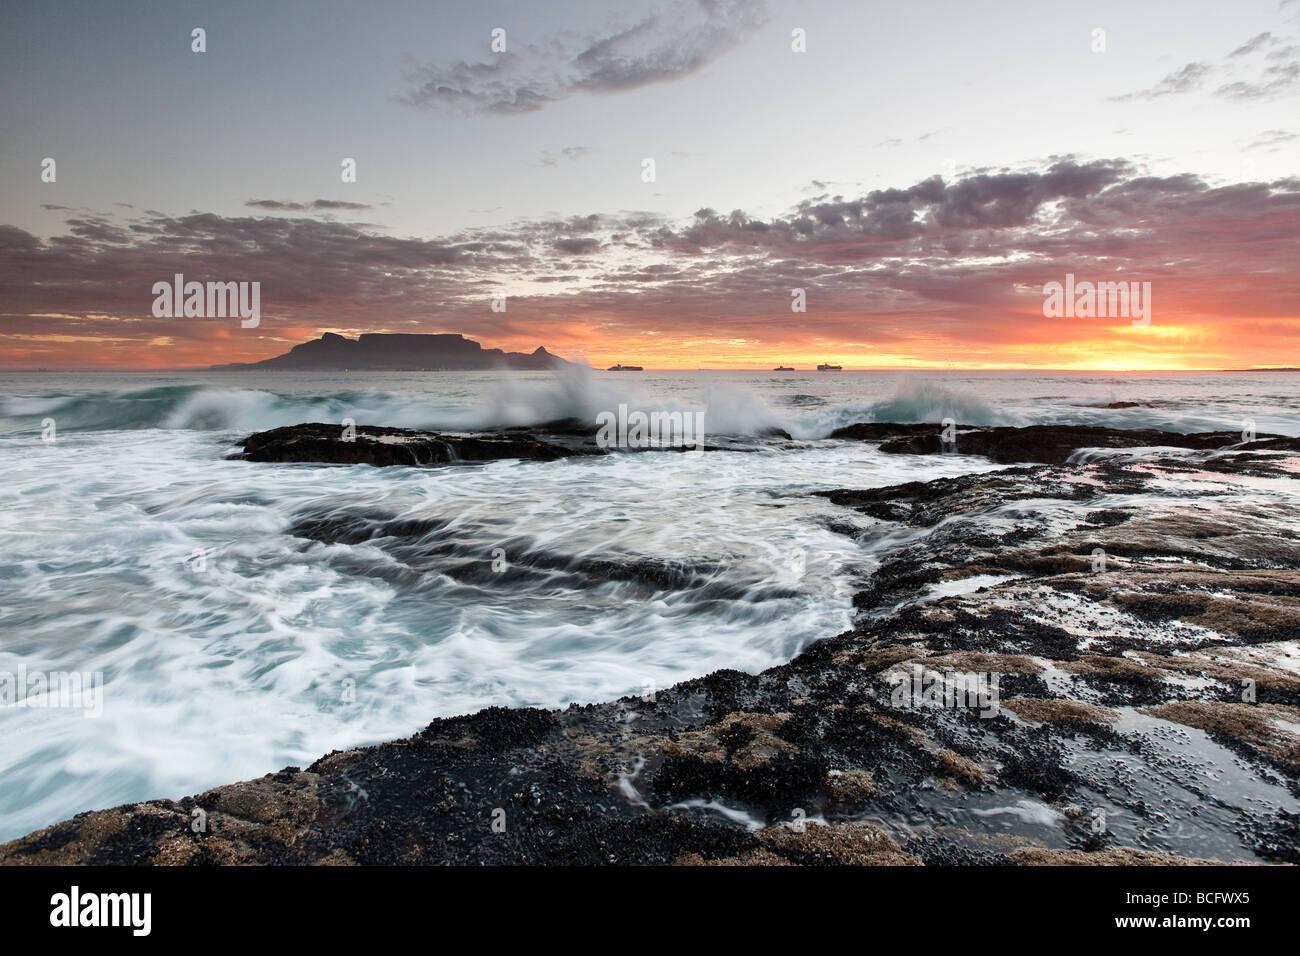 Table Mountain, Cape Town, Atlantic Ocean, Table View, Blouberg Strand, Blouberg Beach, Sunset, Atlantic Seaboard, - Stock Image